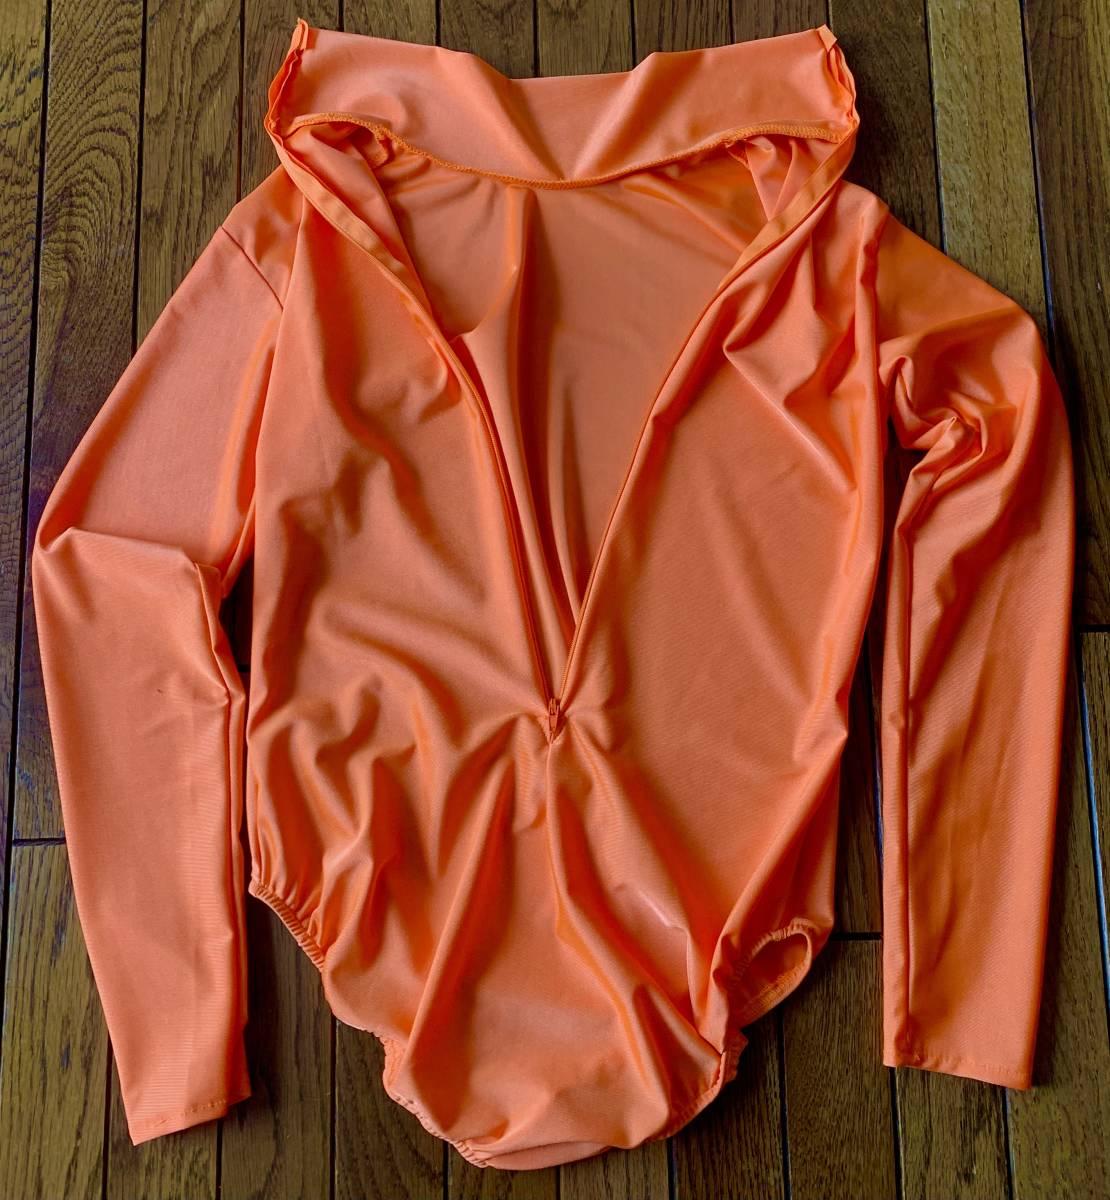 Mサイズ光沢橙色ハイネックレオタード長袖バックファスナー。マスク手袋無全身タイツゼンタイと一緒に着ぐるみエアロビクスヨガズンバにも